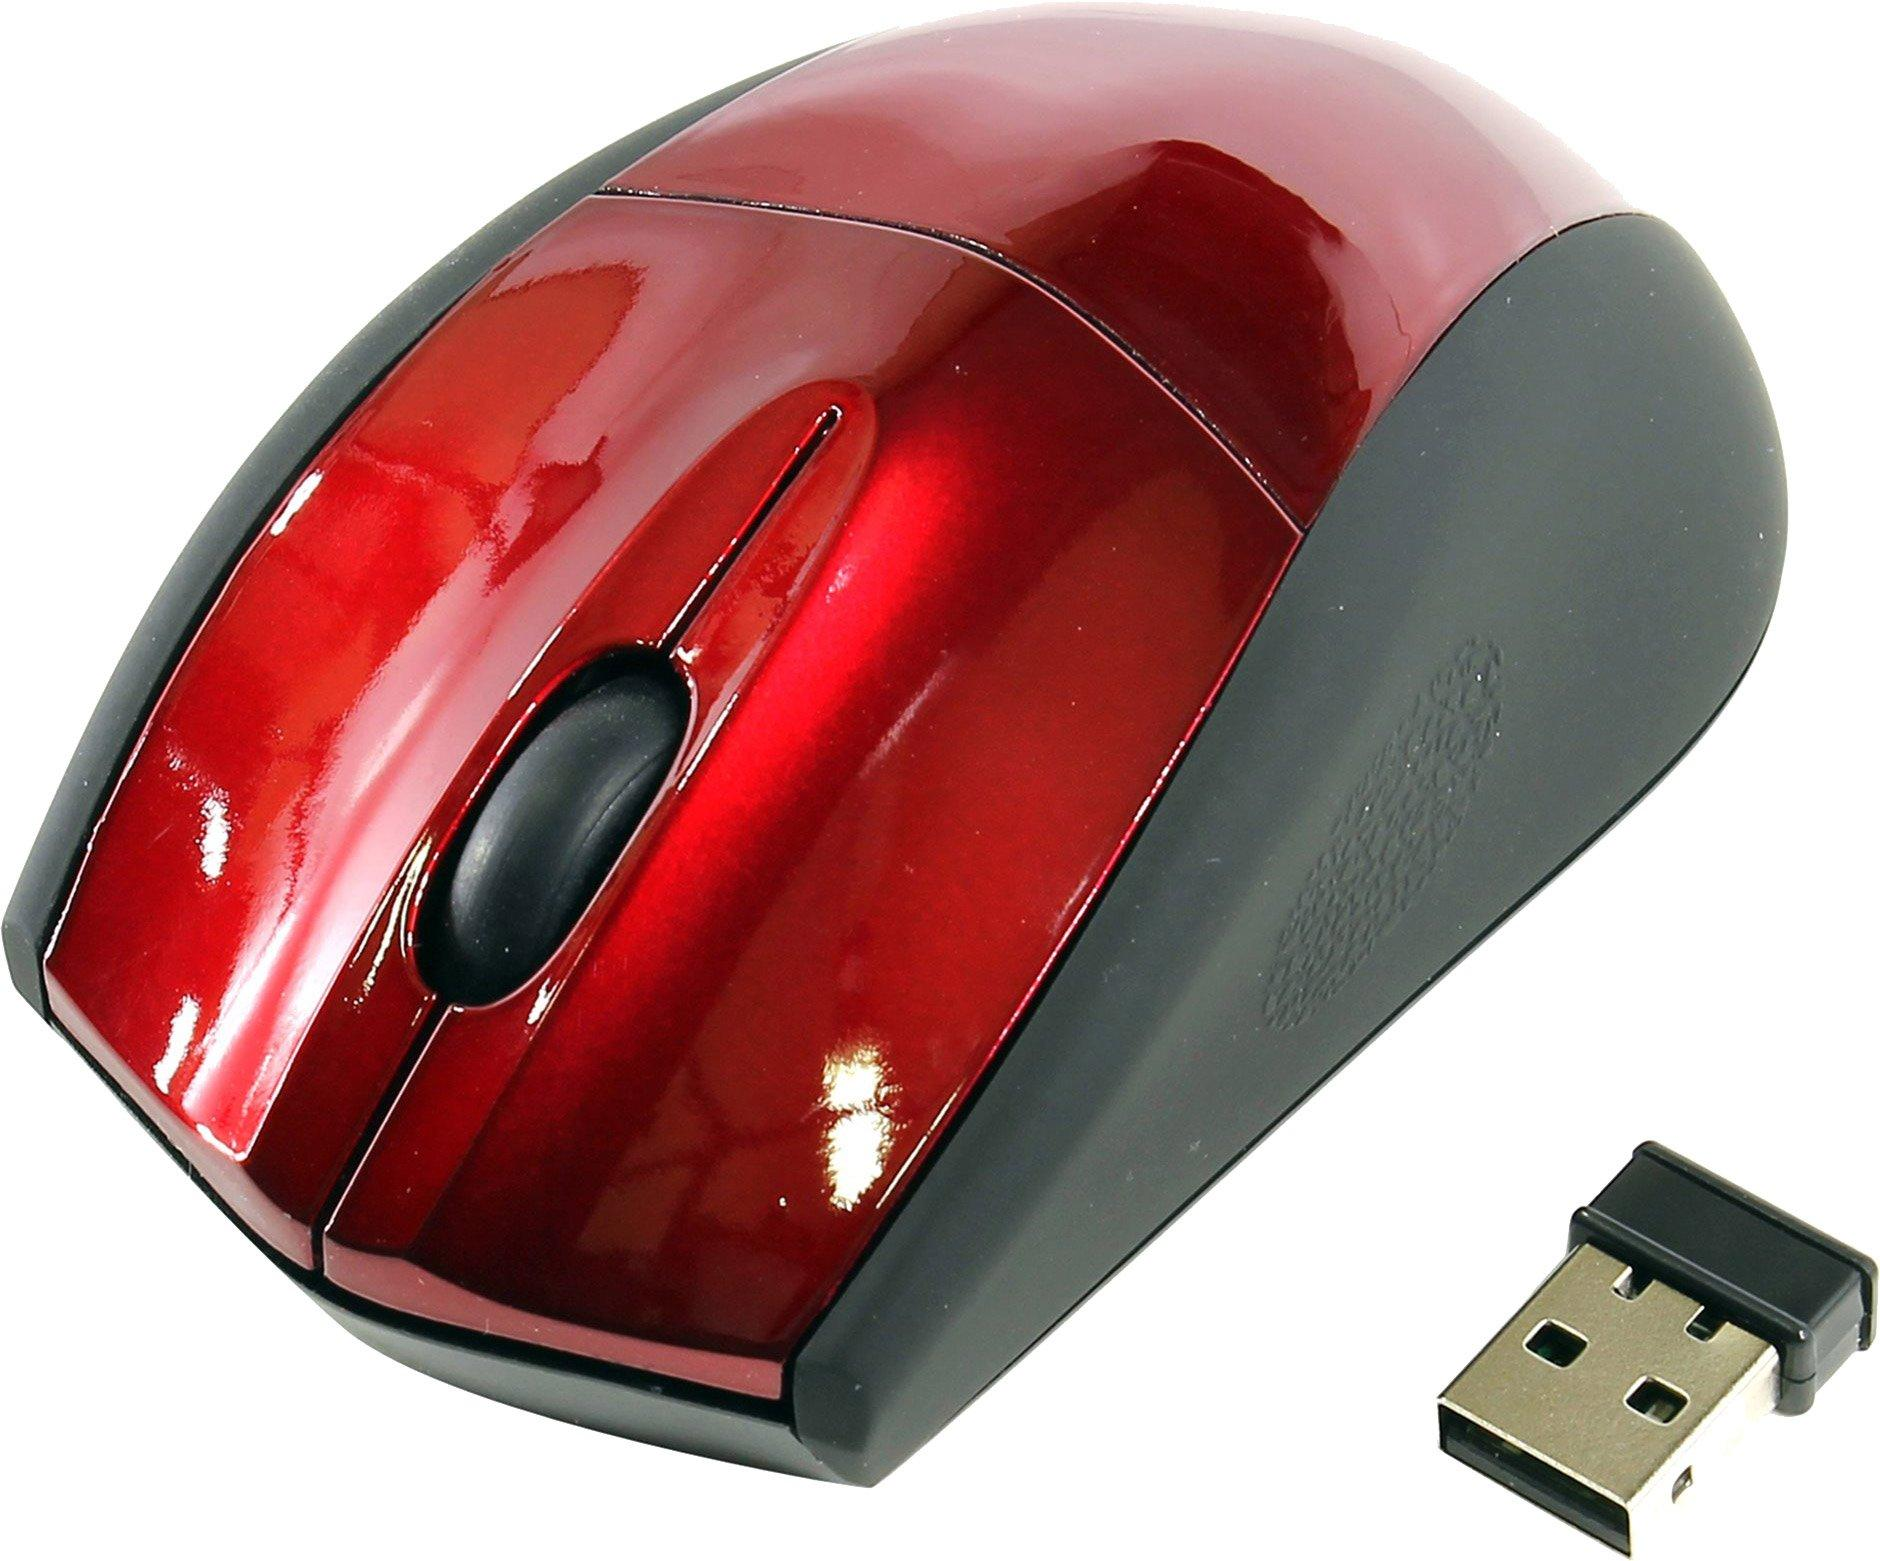 SmartBuy SBM-325AG-R Red